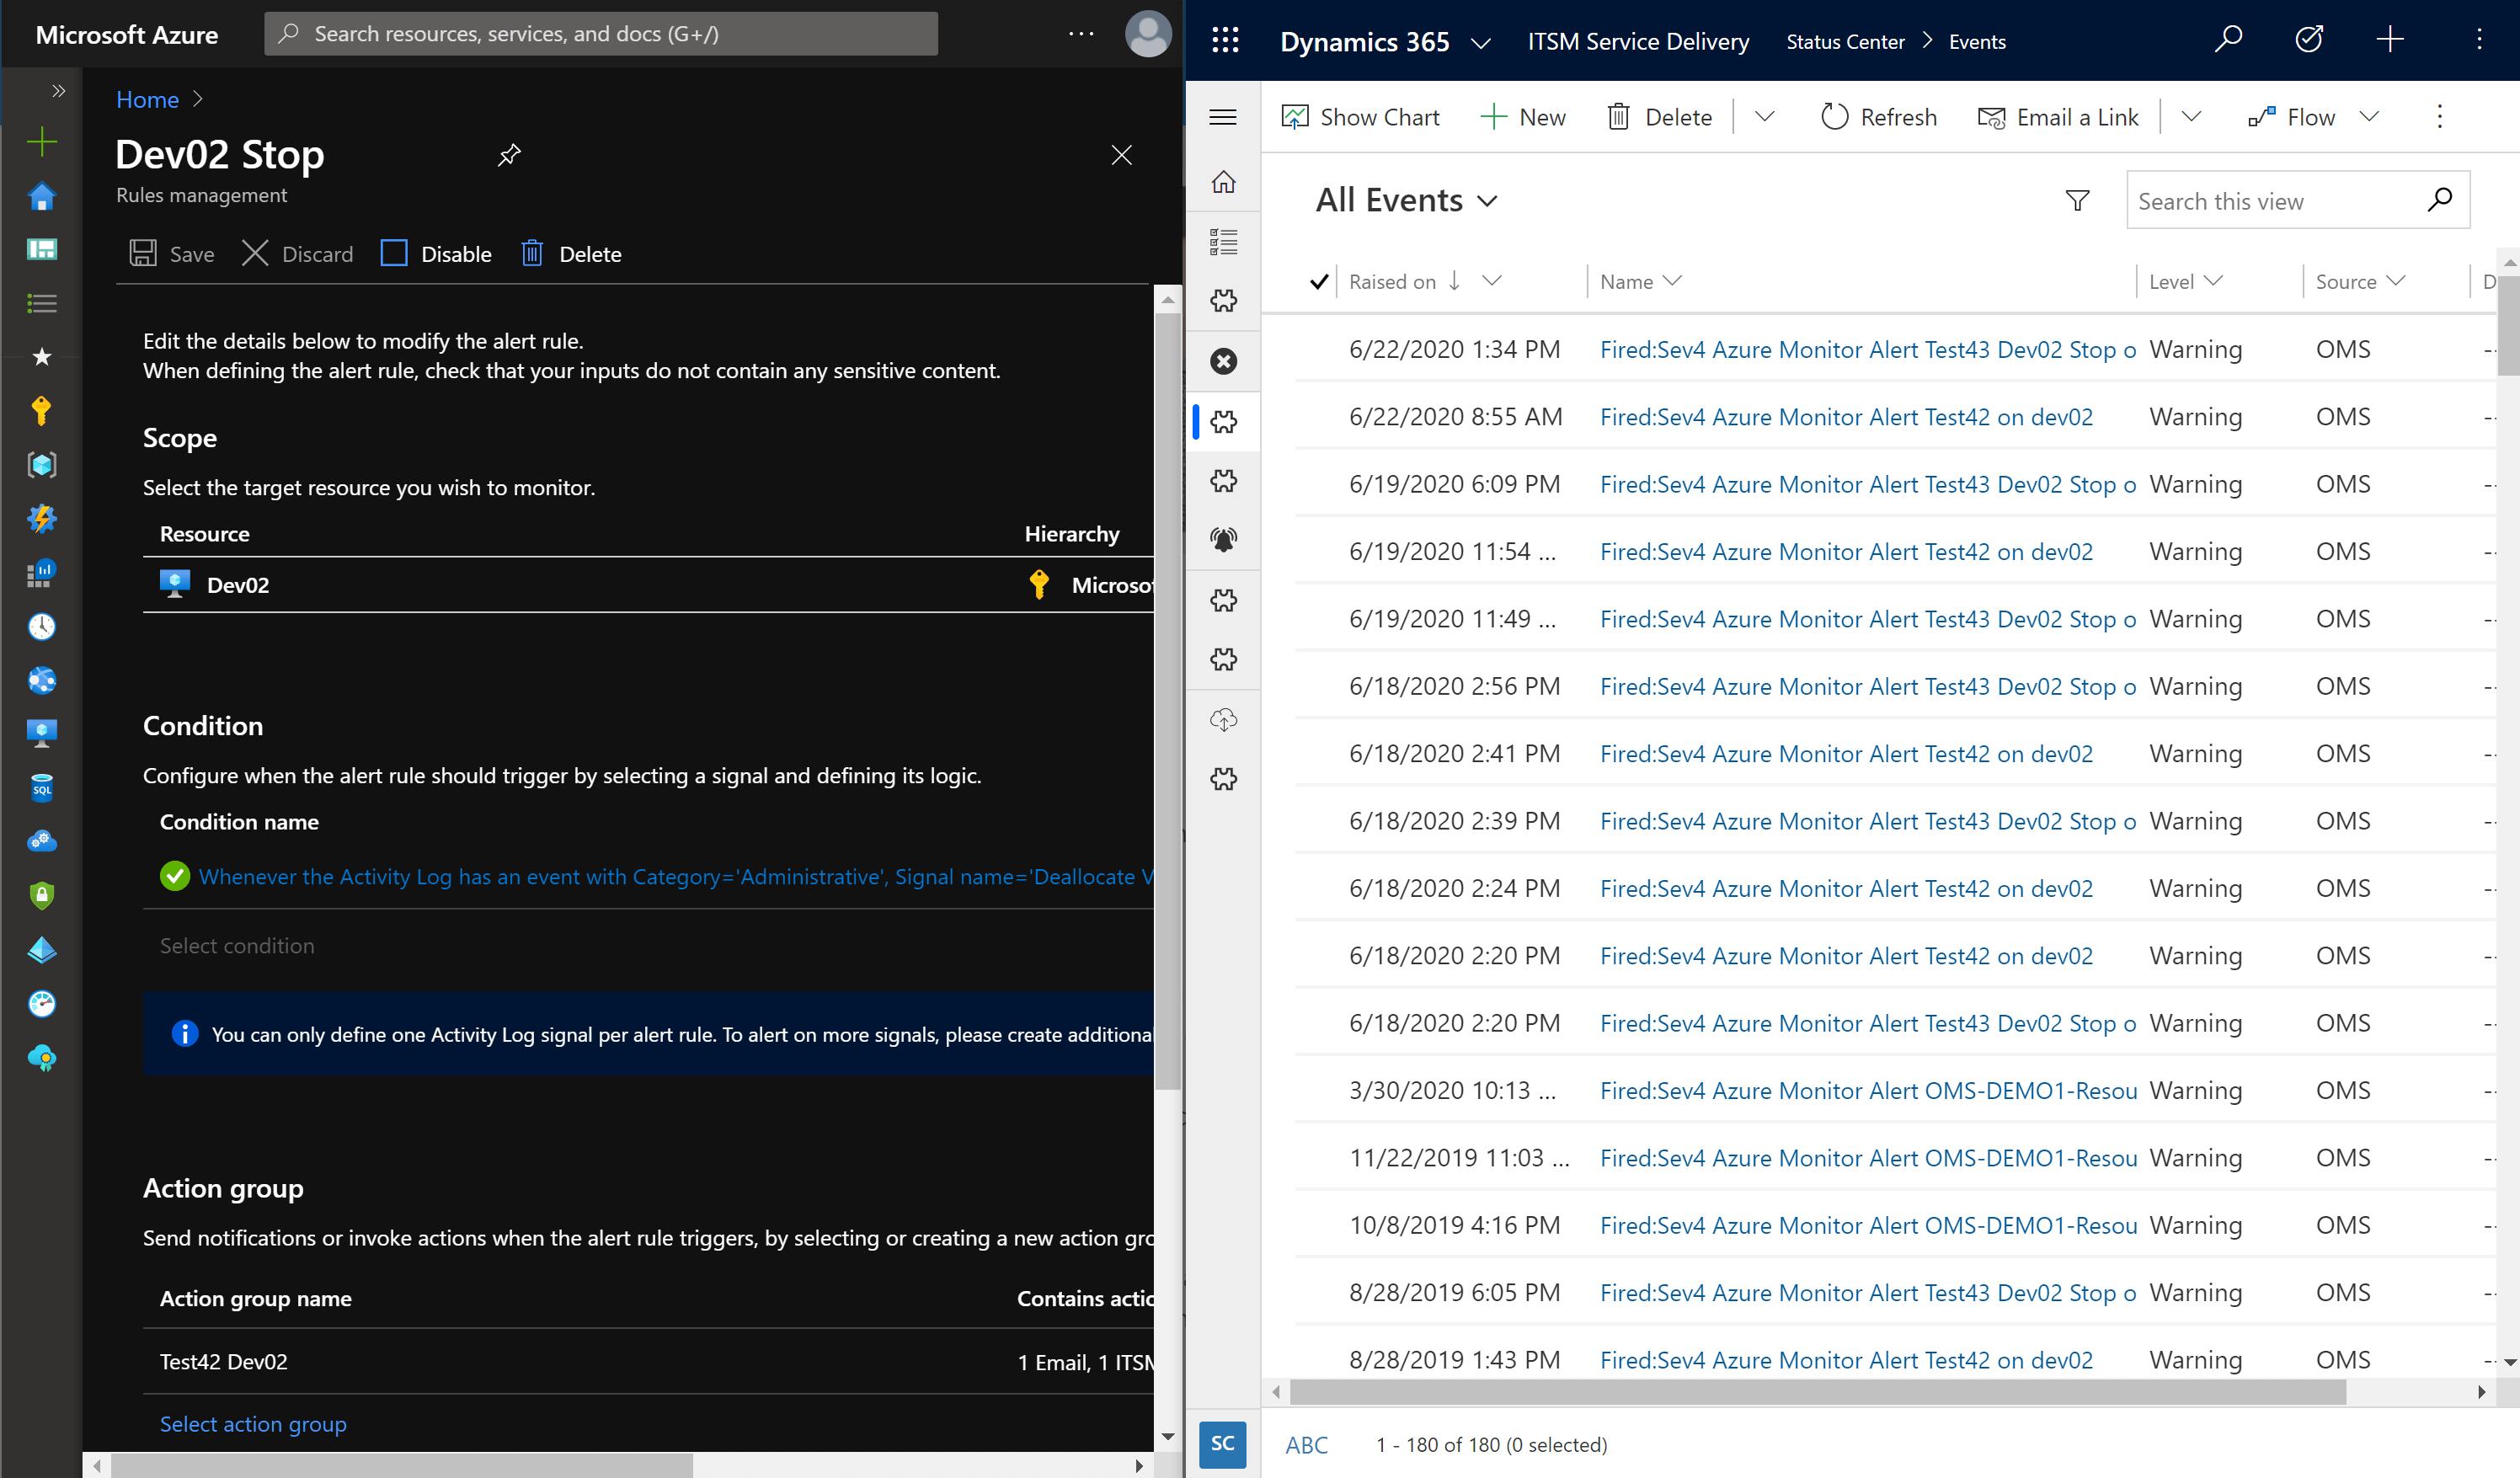 Microsoft Azure Monitor